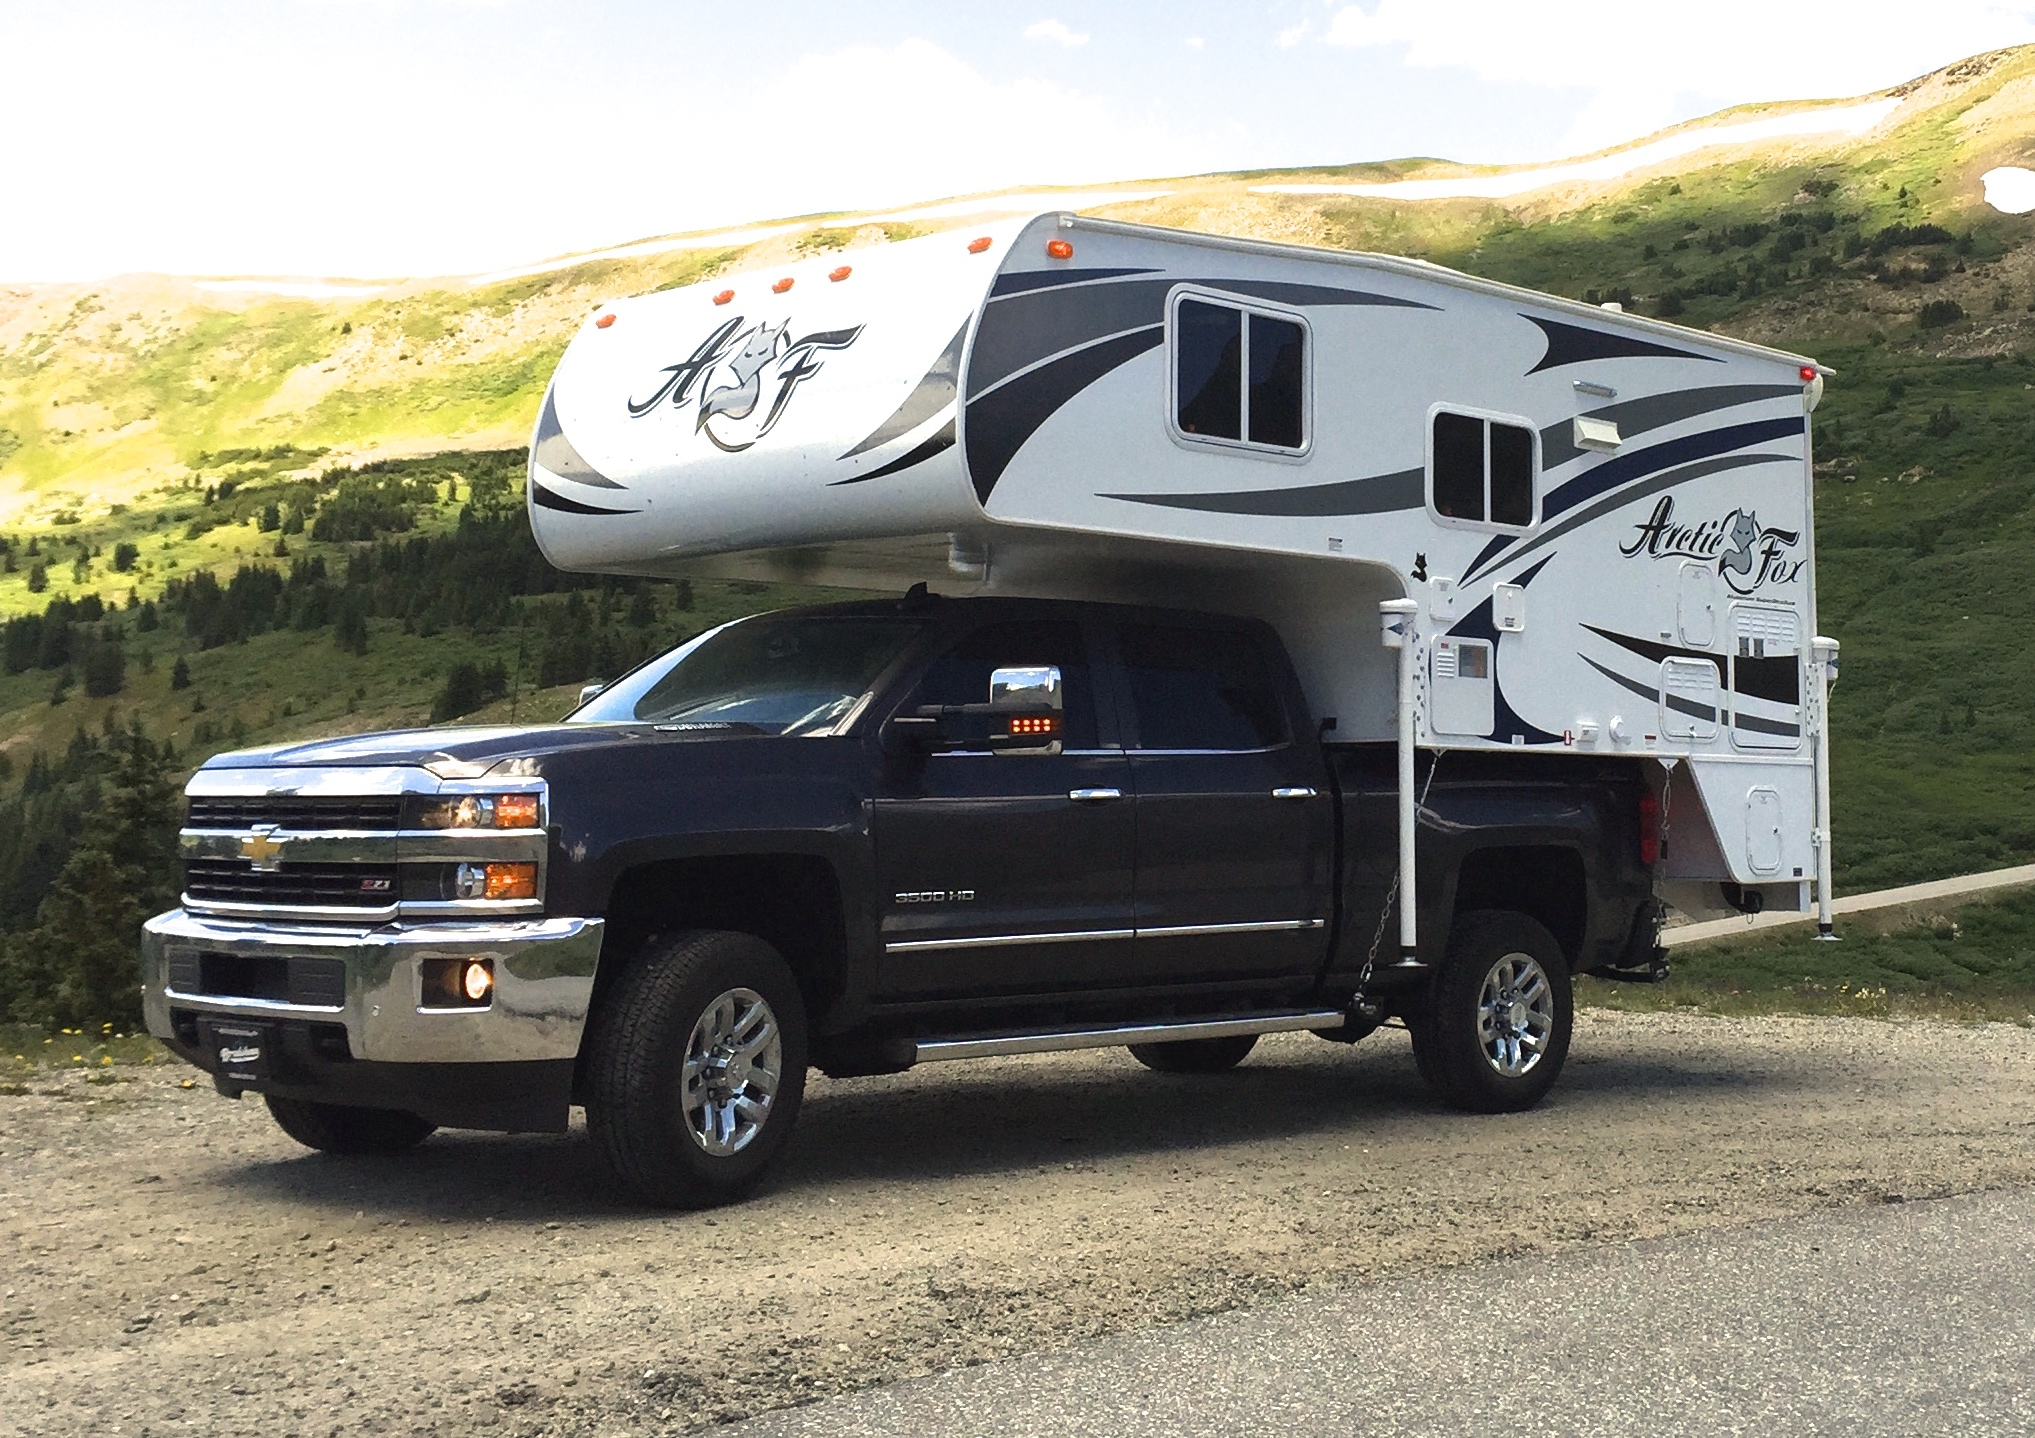 review of the 2015 arctic fox 811 truck camper truck camper adventure. Black Bedroom Furniture Sets. Home Design Ideas